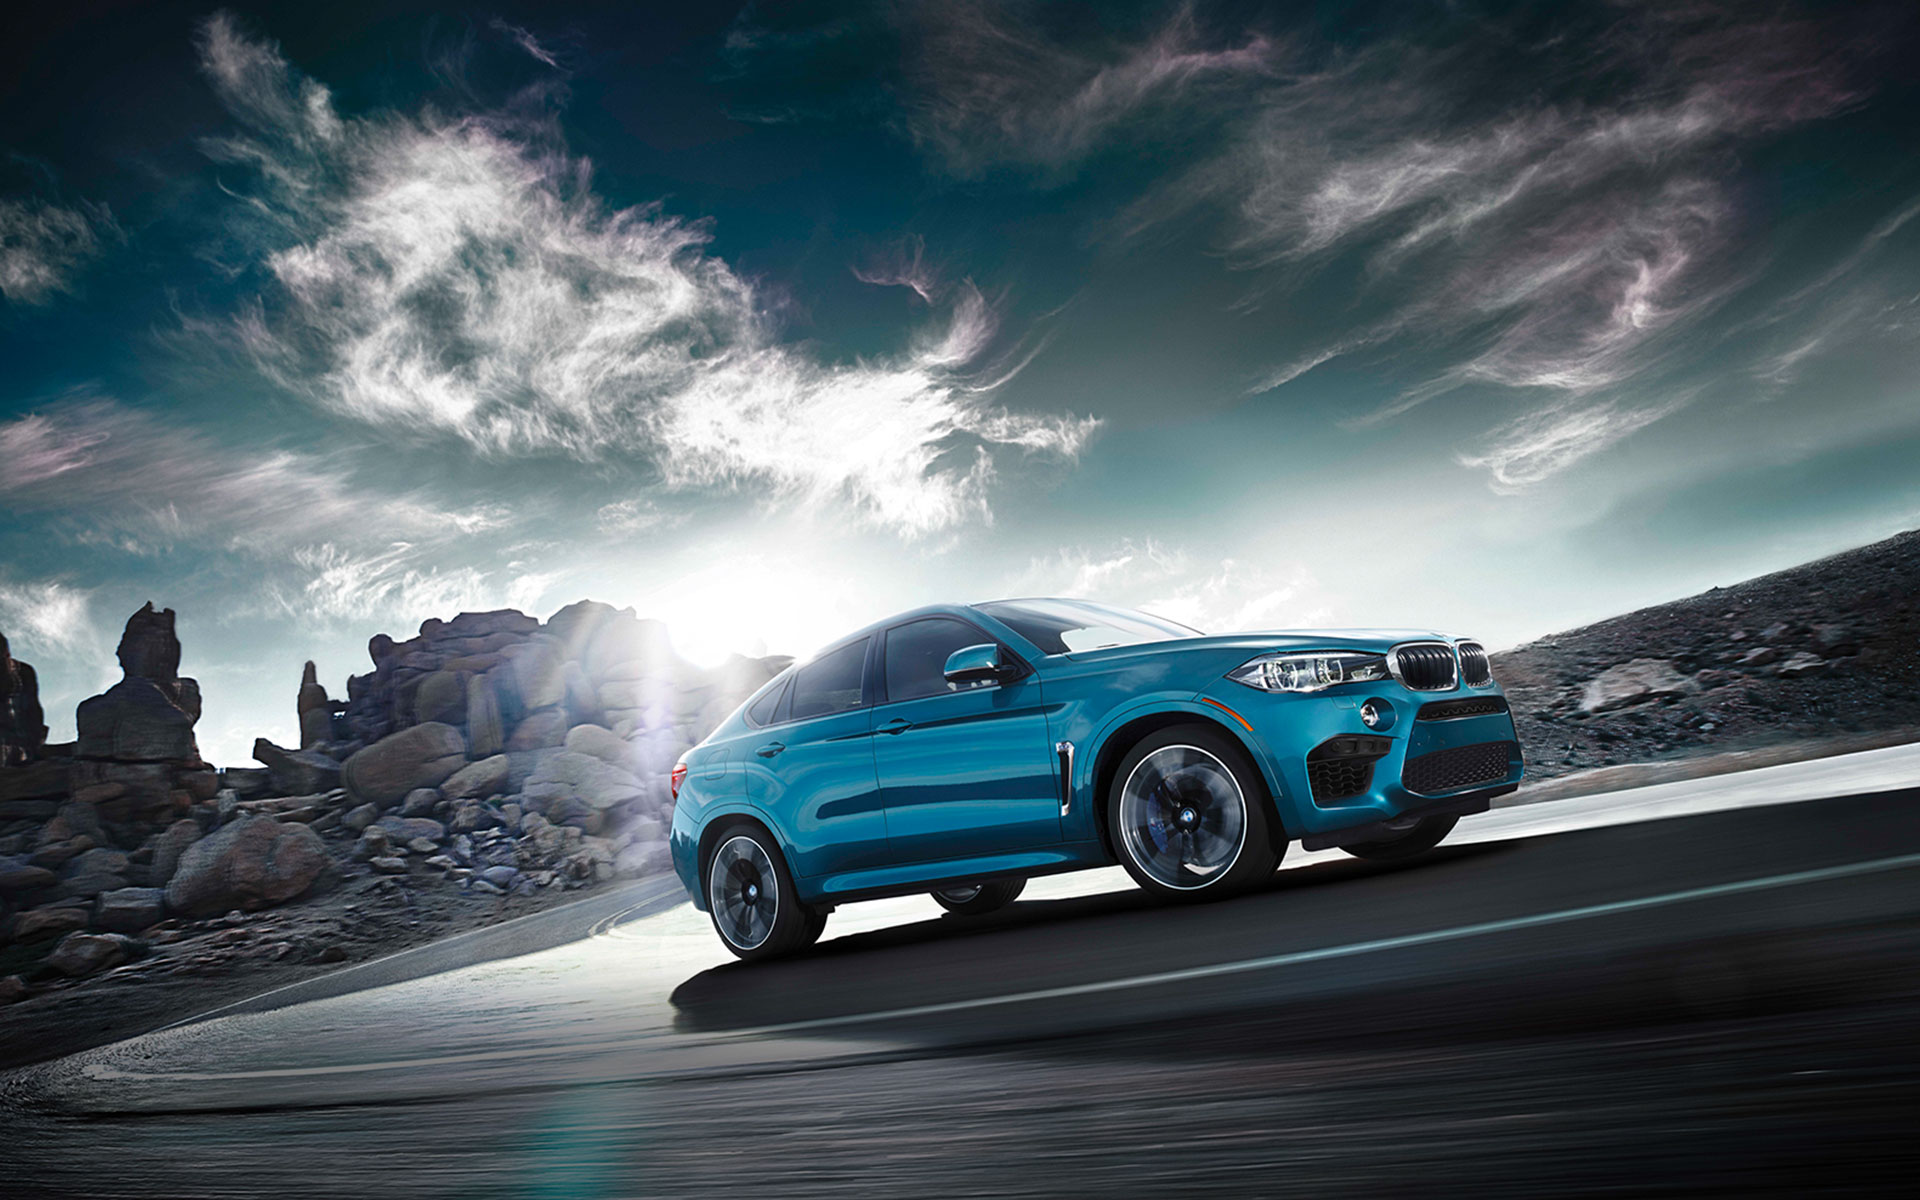 BMW X6M image 002